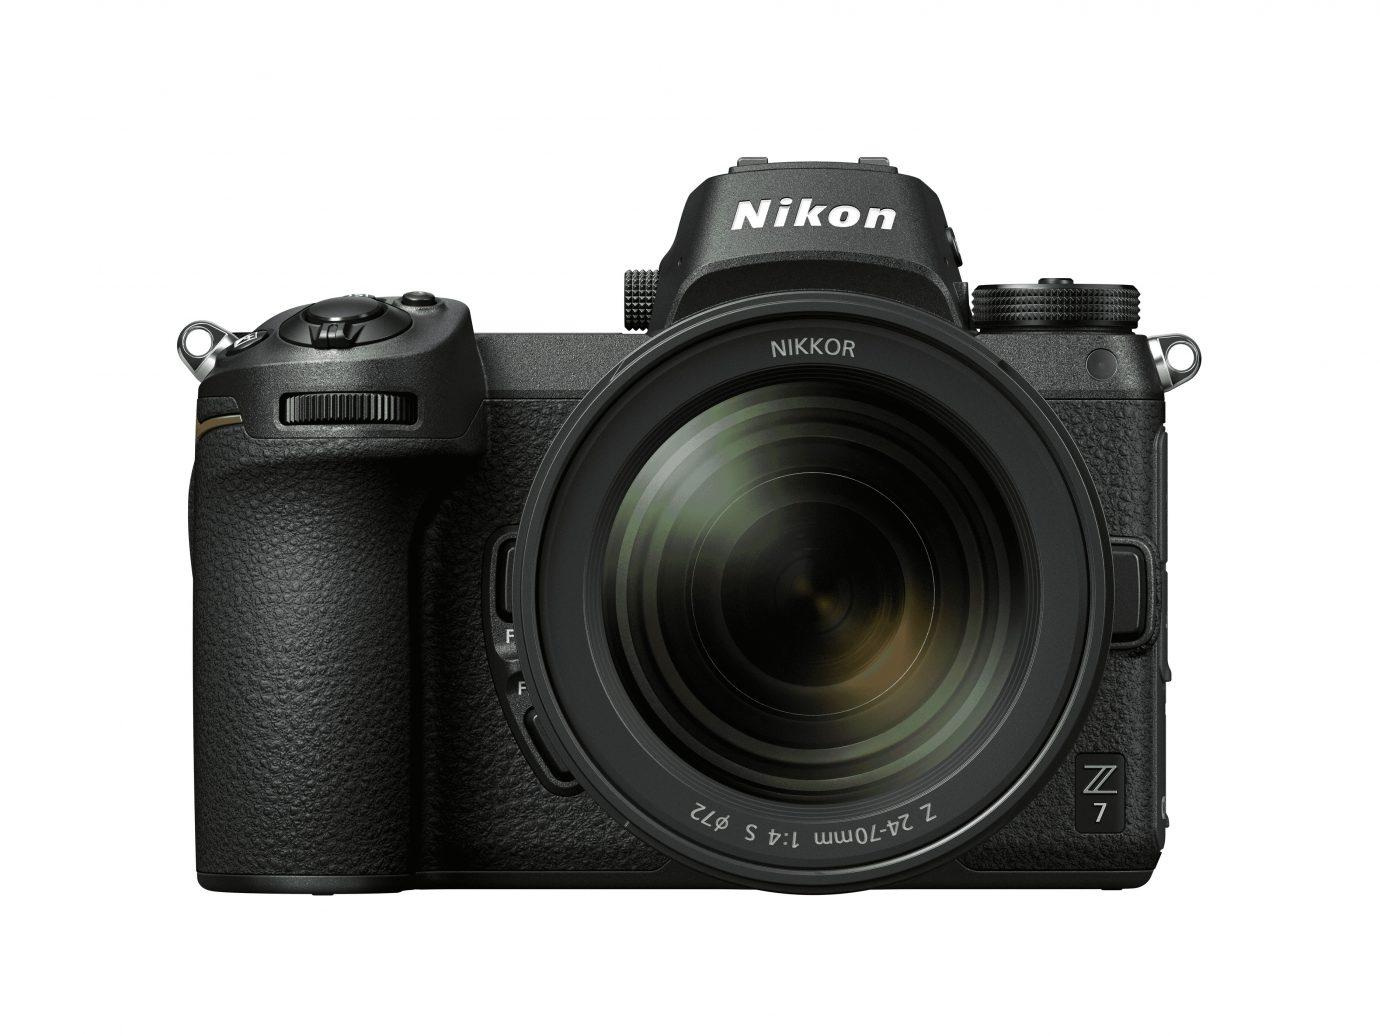 Nikon Z7 mirrorless camera